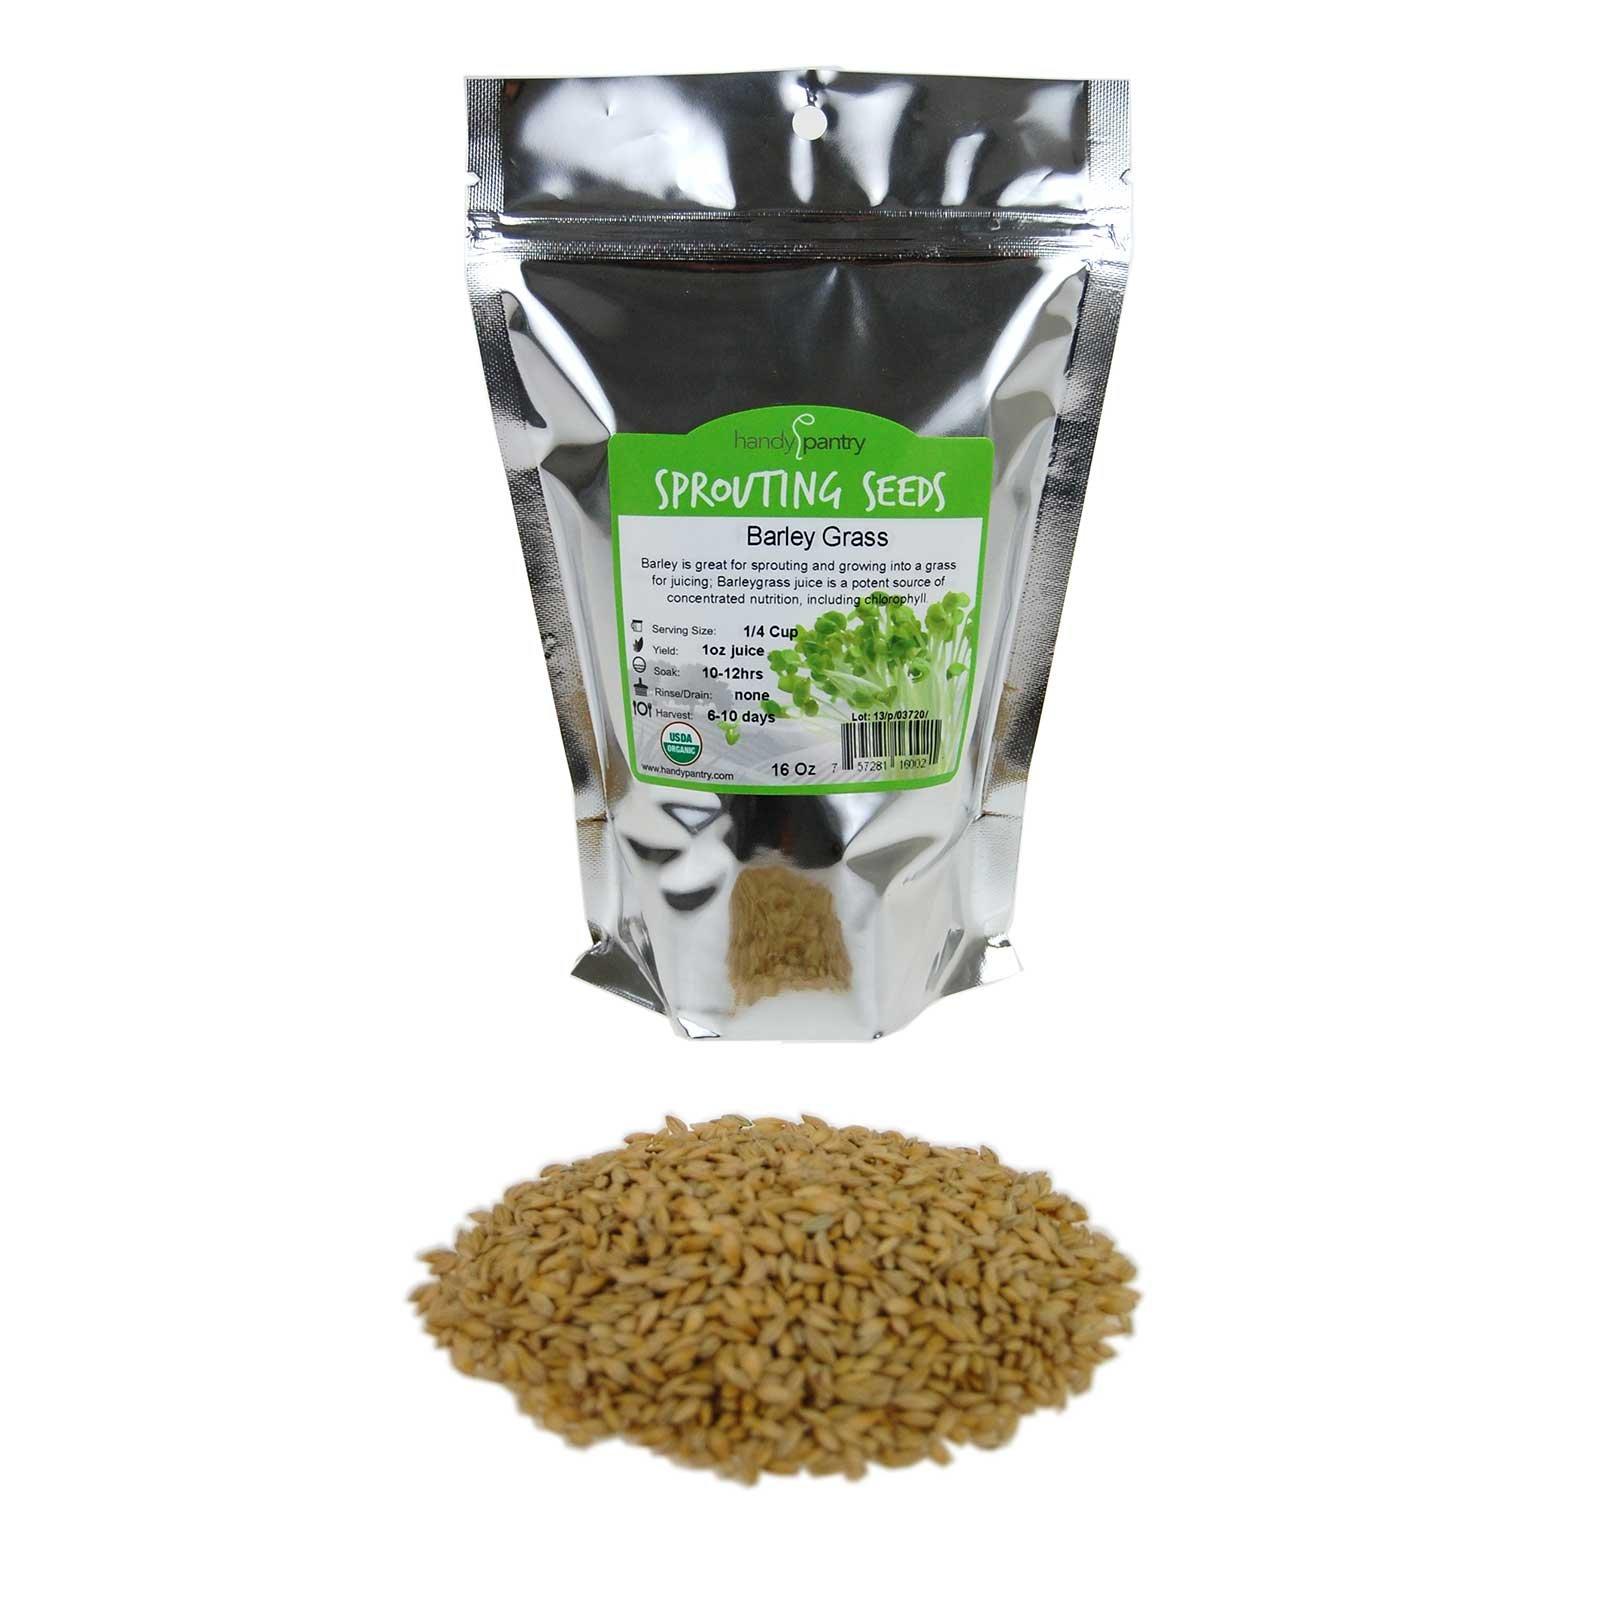 Organic Barley Seeds - 1 Lbs - Whole (Hull Intact) Barleygrass Seed - Ornamental Barley Grass, Juicing - Grain for Beer Making, Emergency Food Storage & More